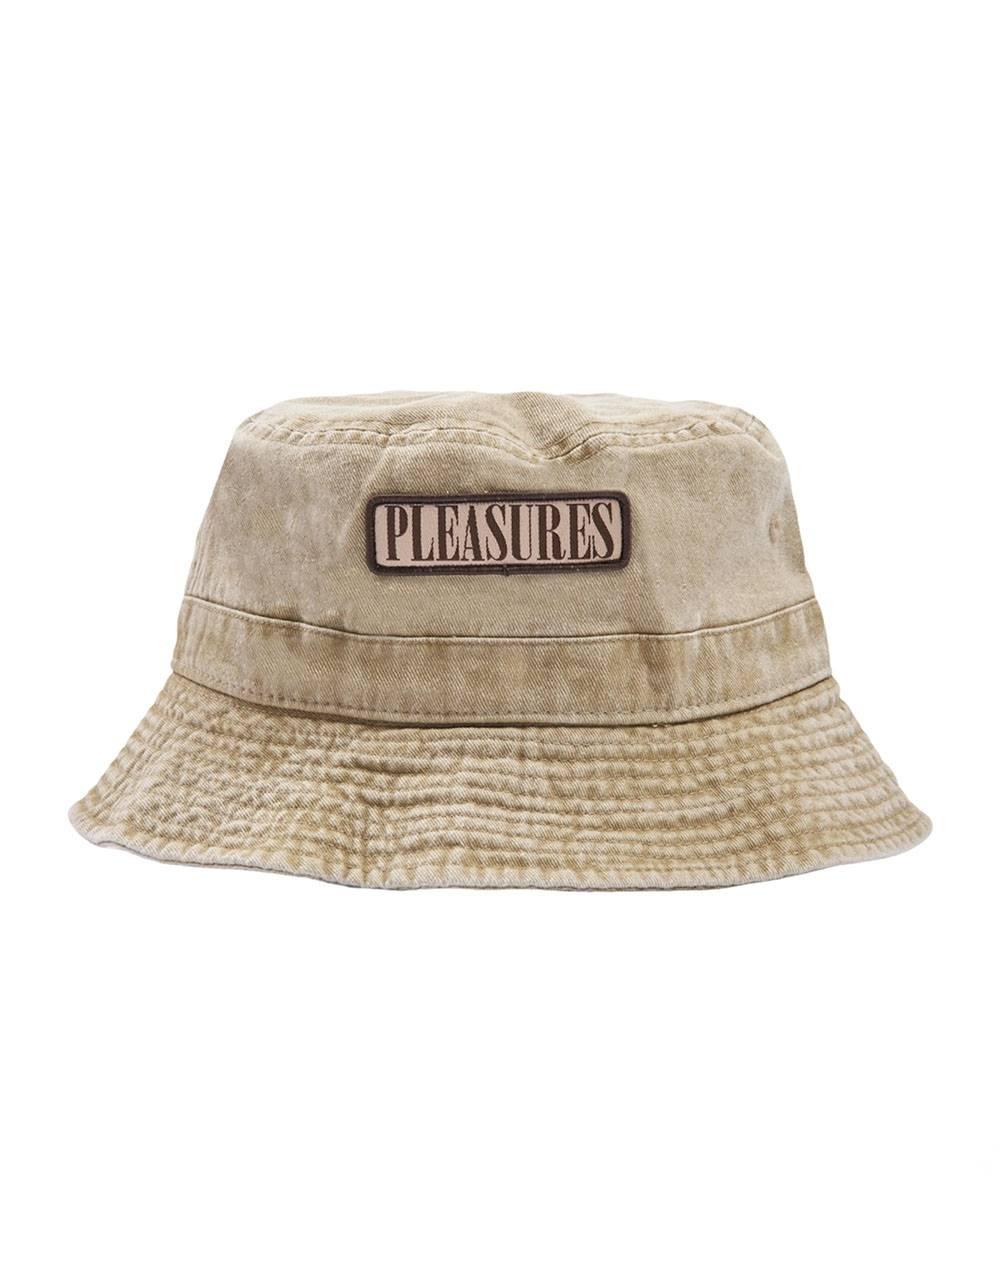 Pleasures Spank bucket hat - washed khaki Pleasures Hat 55,00€